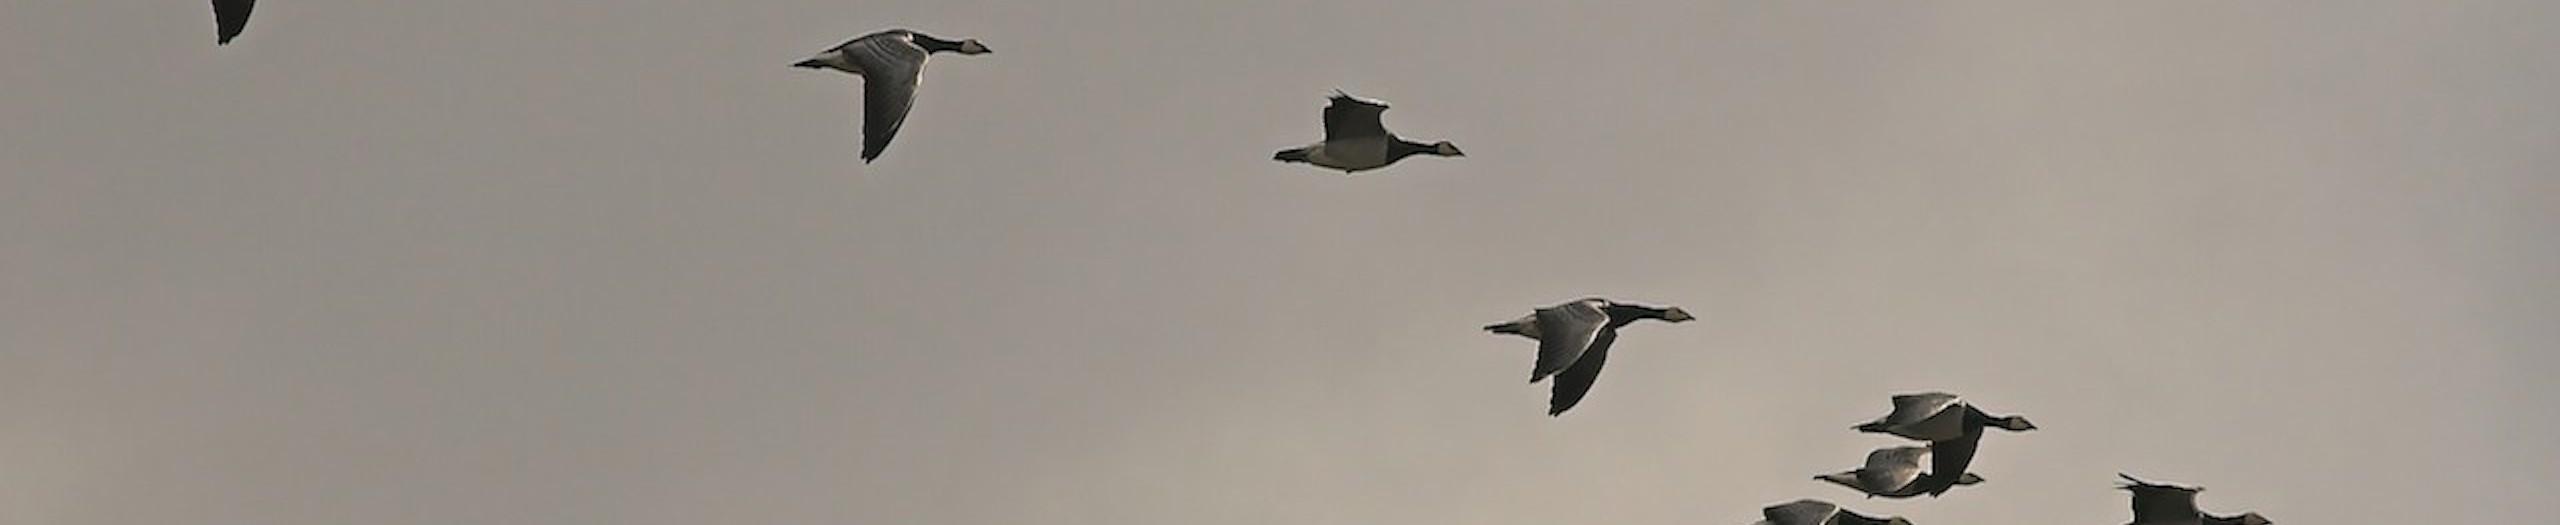 The Ornithologist's Last Wish